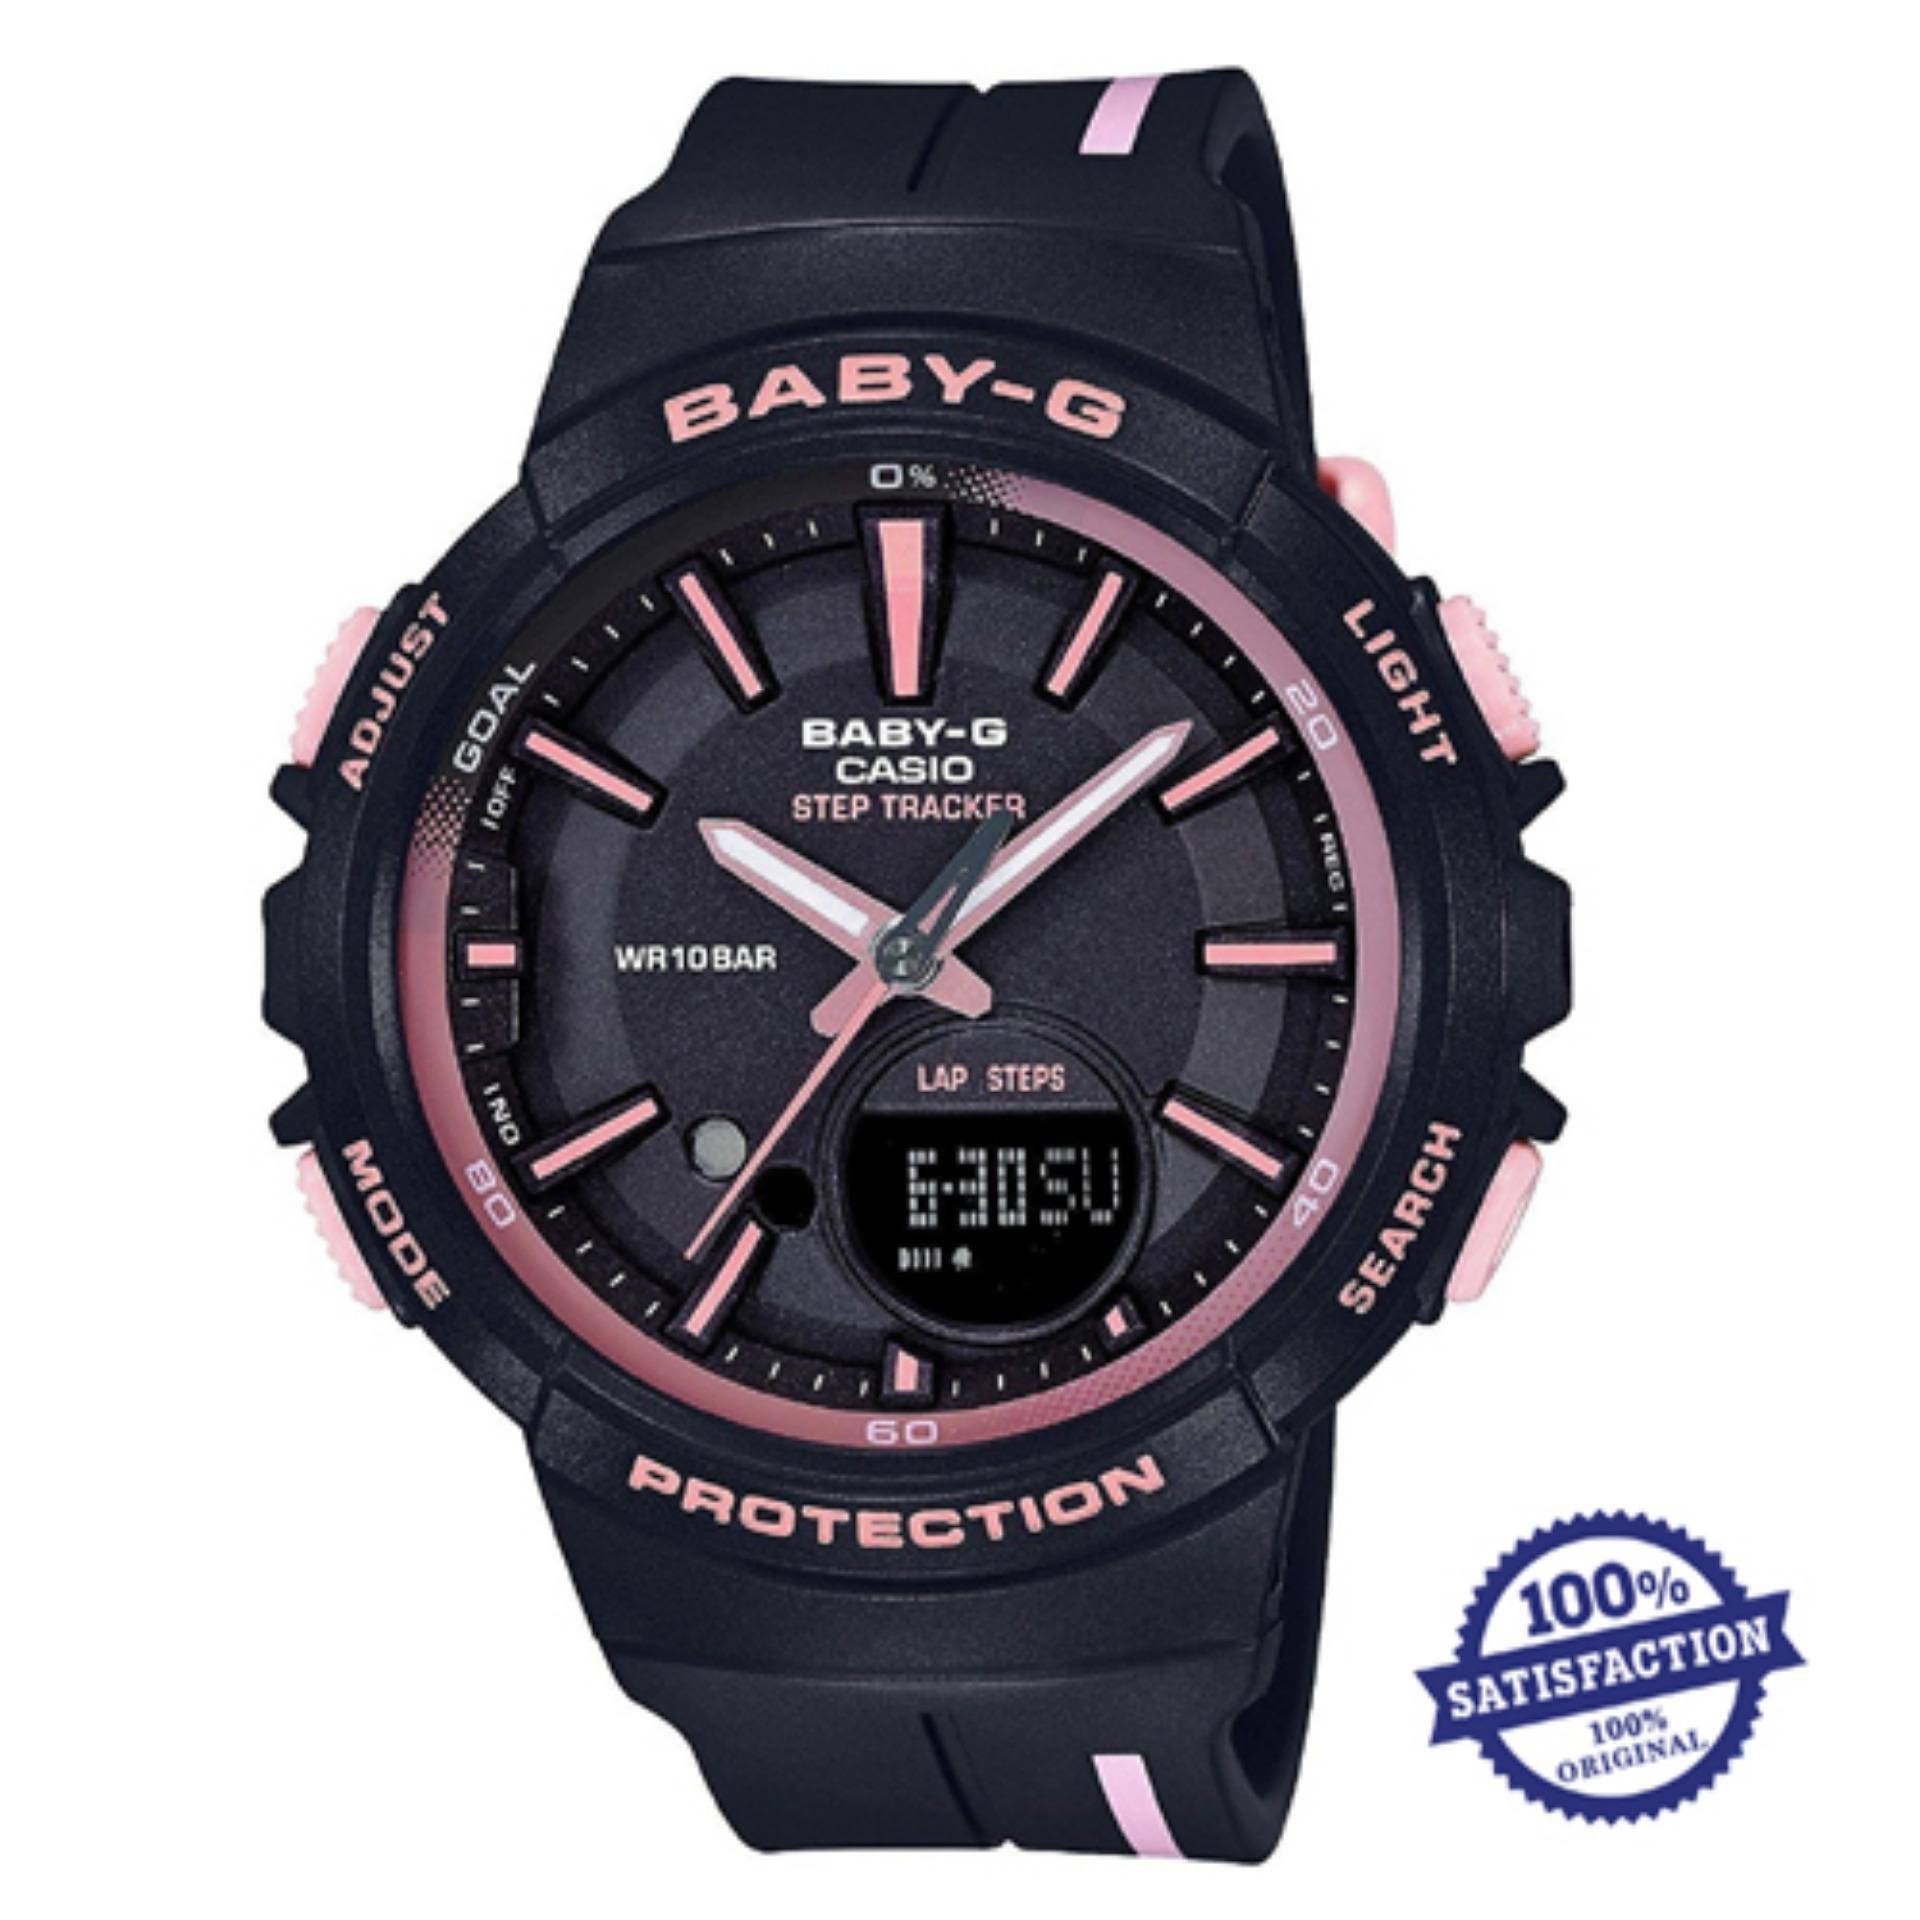 Casio Baby G Philippines Price List Jam Tangan Cewek Bga 180 3b Original Bgs 100rt 1a Mineral Glass Womens Watch